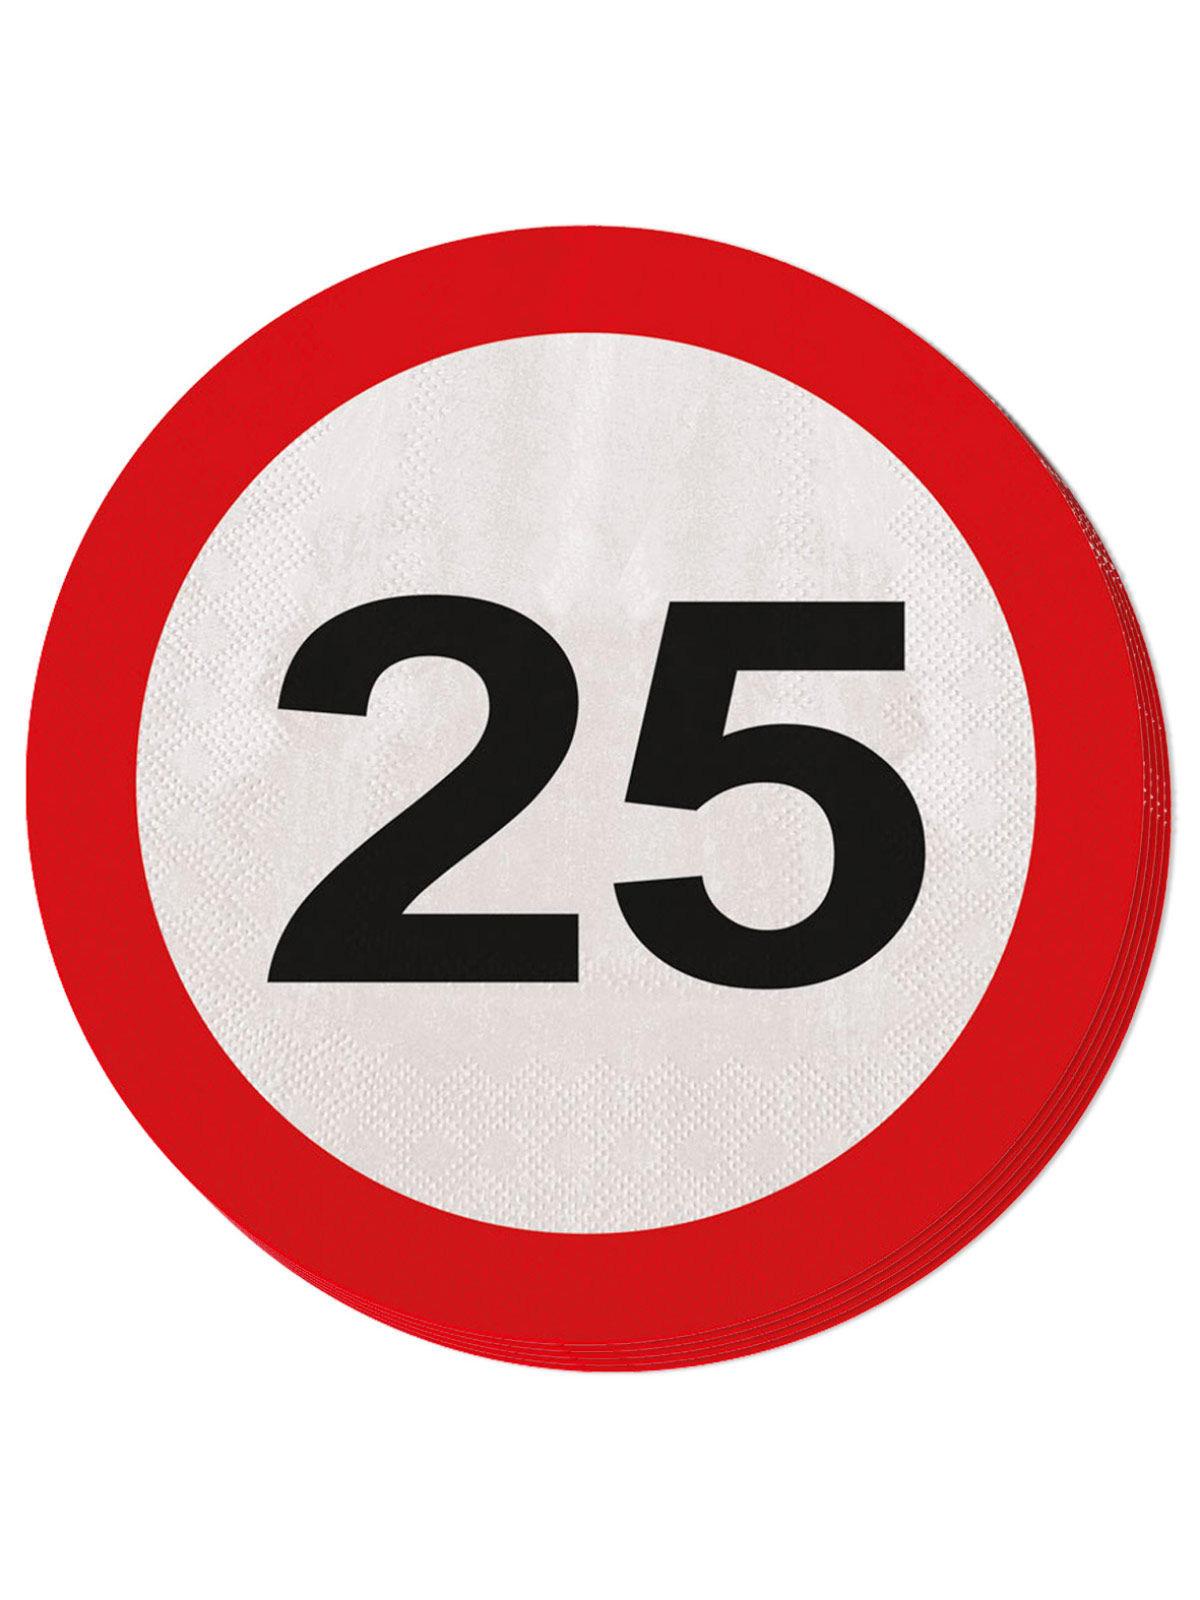 25 Geburtstag Servietten Party Deko 20 Stuck Rot Weiss 25cm